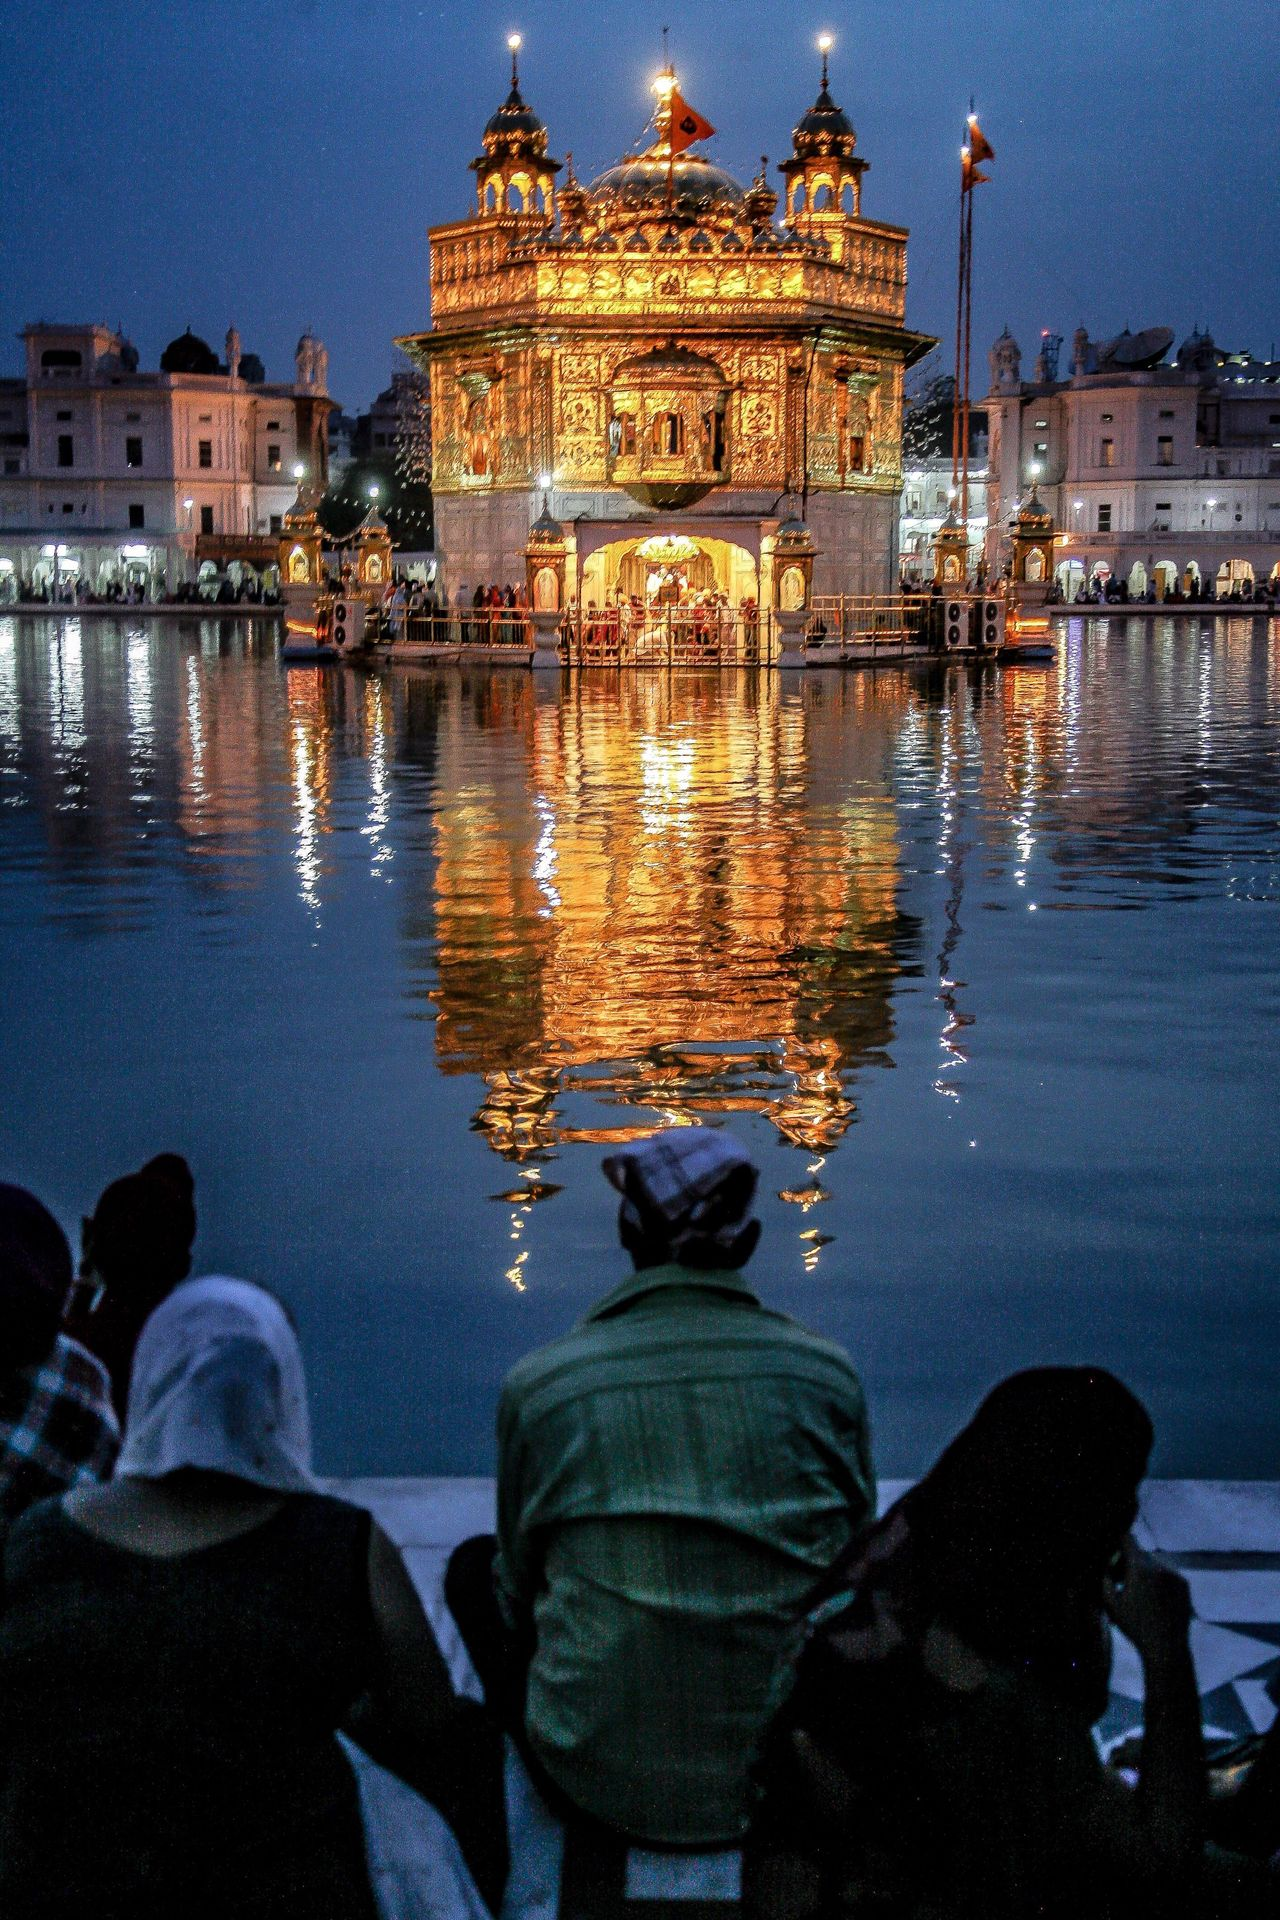 Architecture Travel Destinations Real People Place Of Worship Illuminated Amritsar Golden Temple India Sikhism Pilgrimage